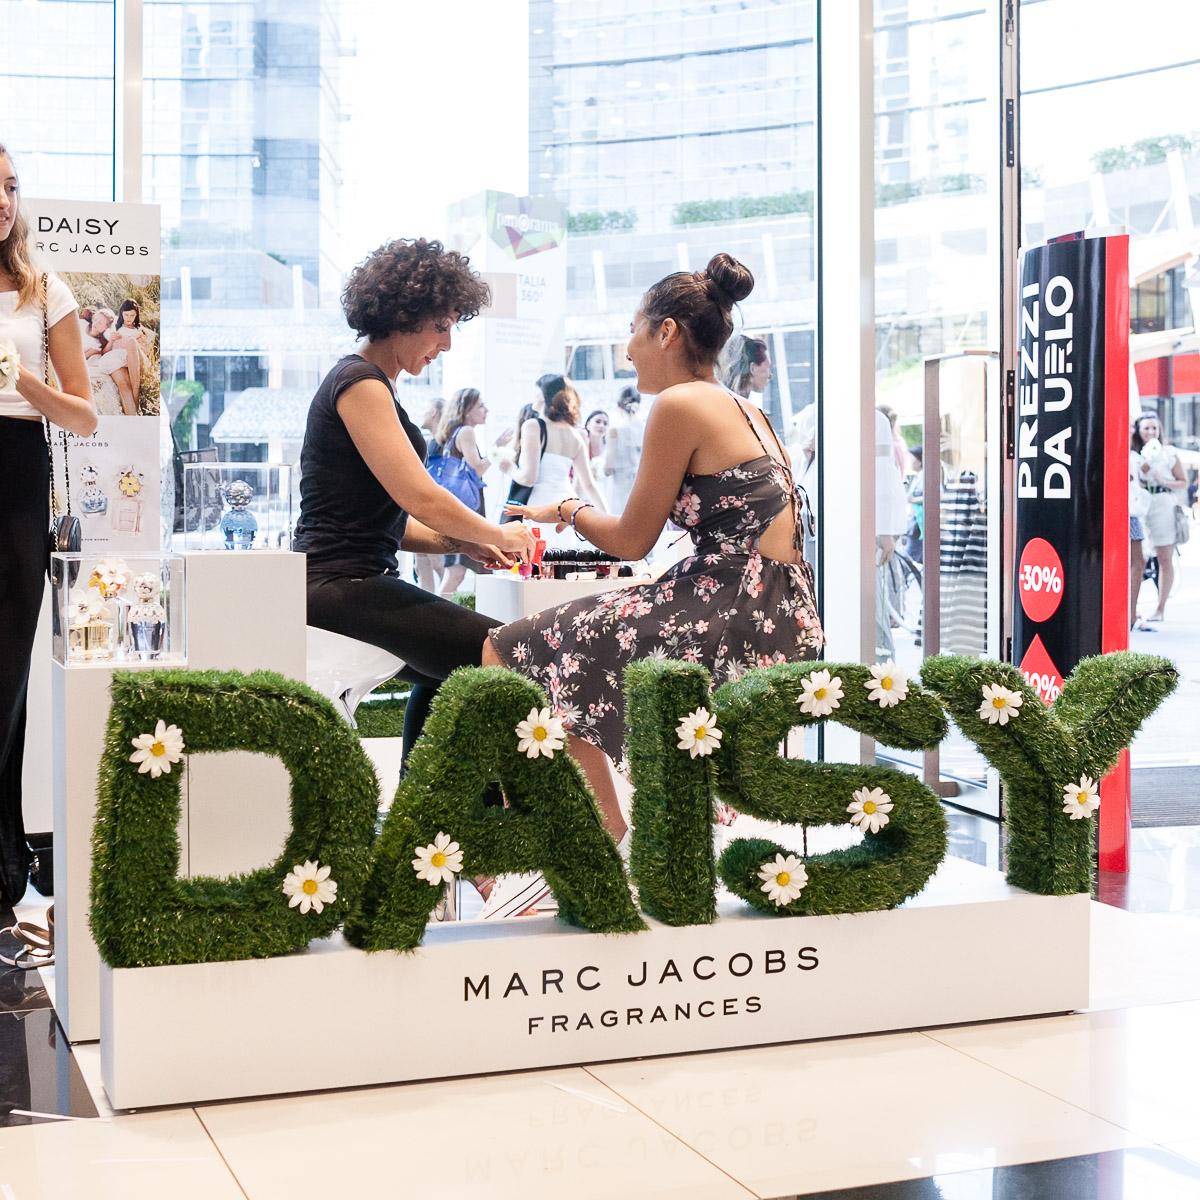 marc-jacobs-daisy-margherita-nuovo-profumo-valentina-coco-zagufashion